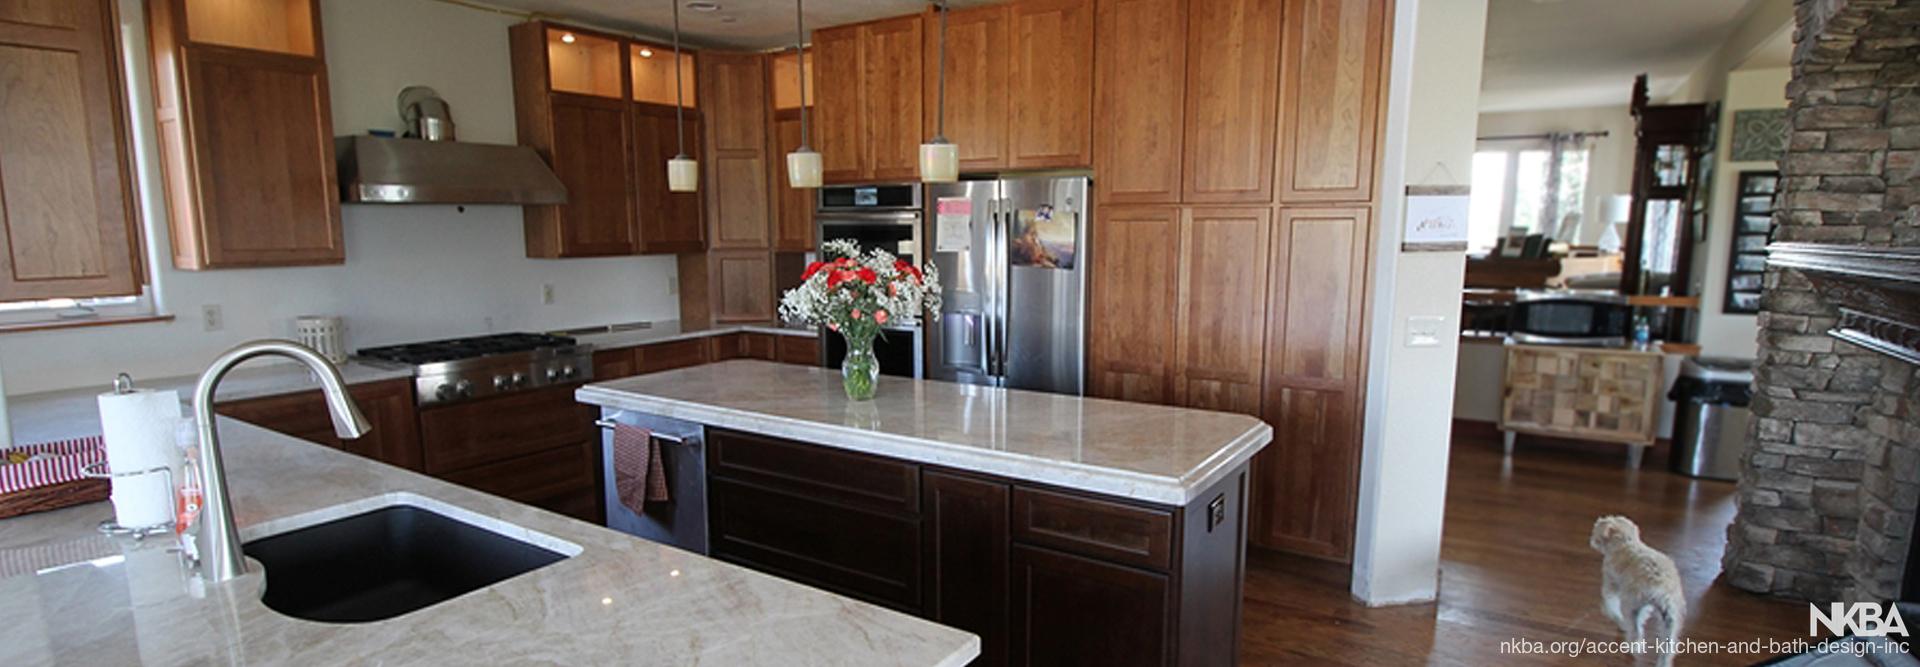 Accent Planning Kitchen and Bath Design INC - NKBA